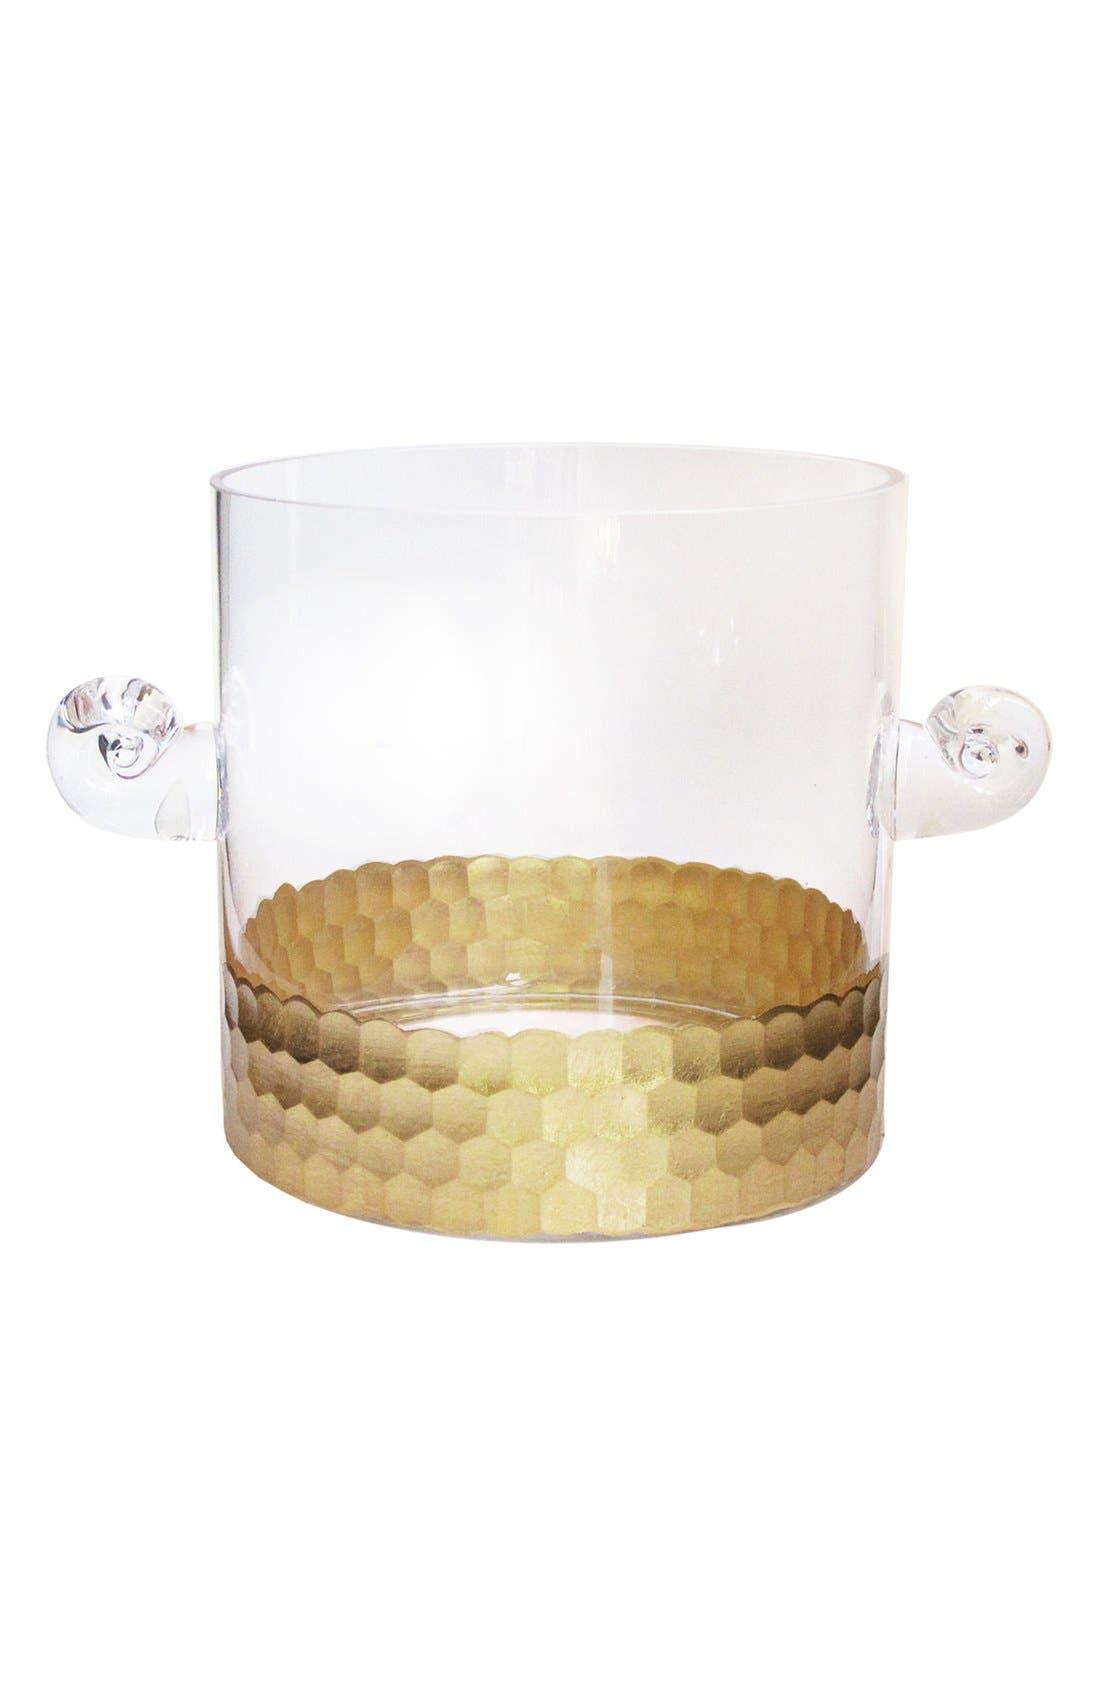 American Atelier Daphne Ice Bucket